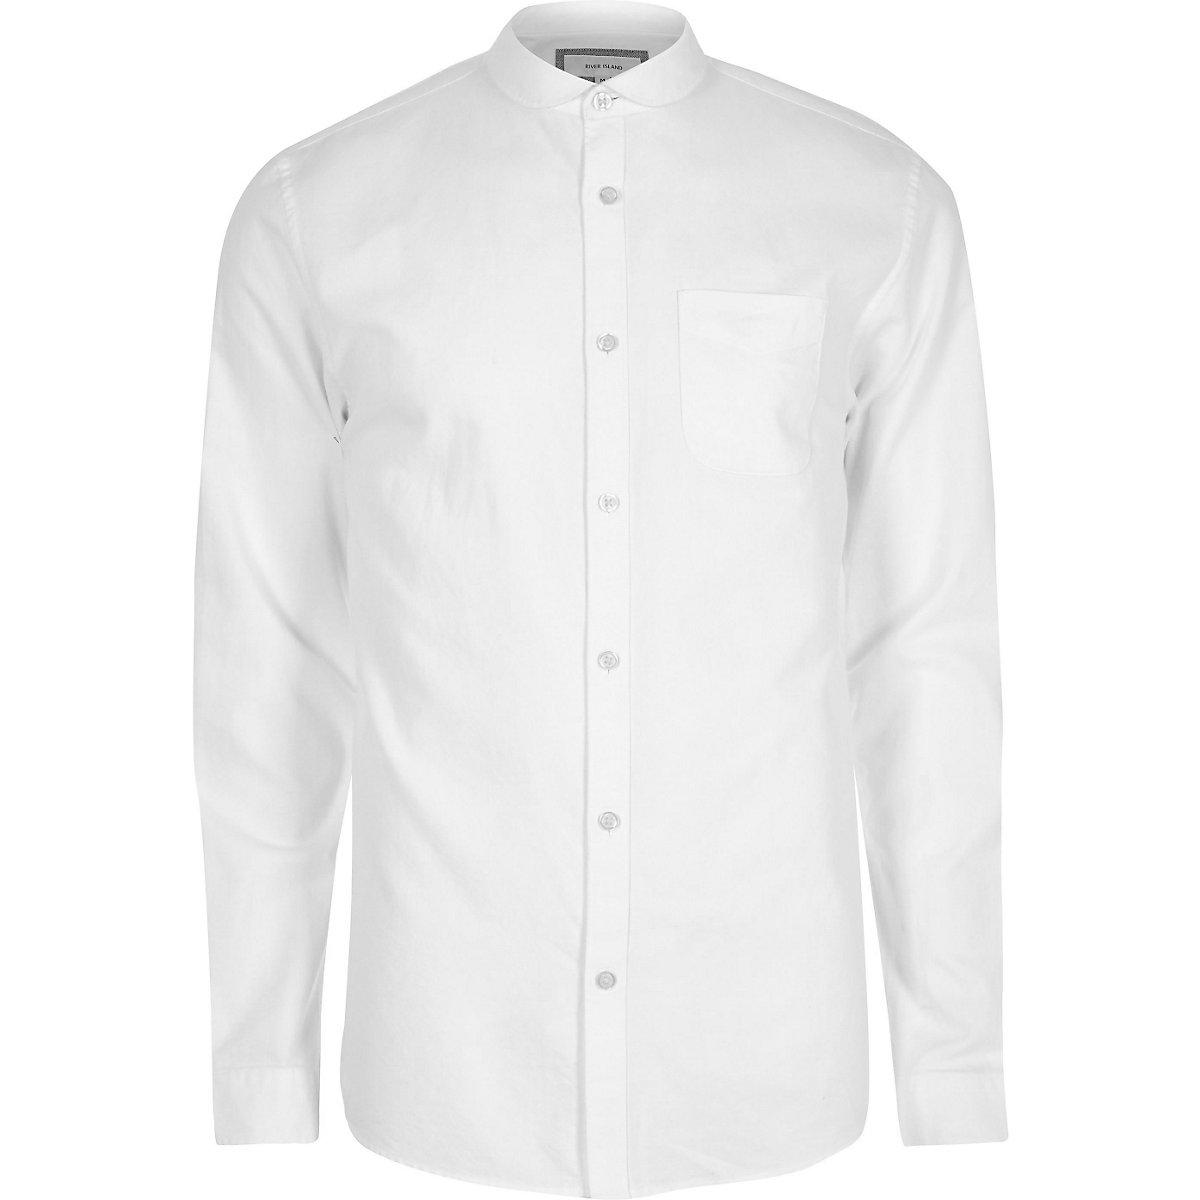 7b8ca09f White cotton penny collar Oxford shirt - Long Sleeve Shirts - Shirts - men